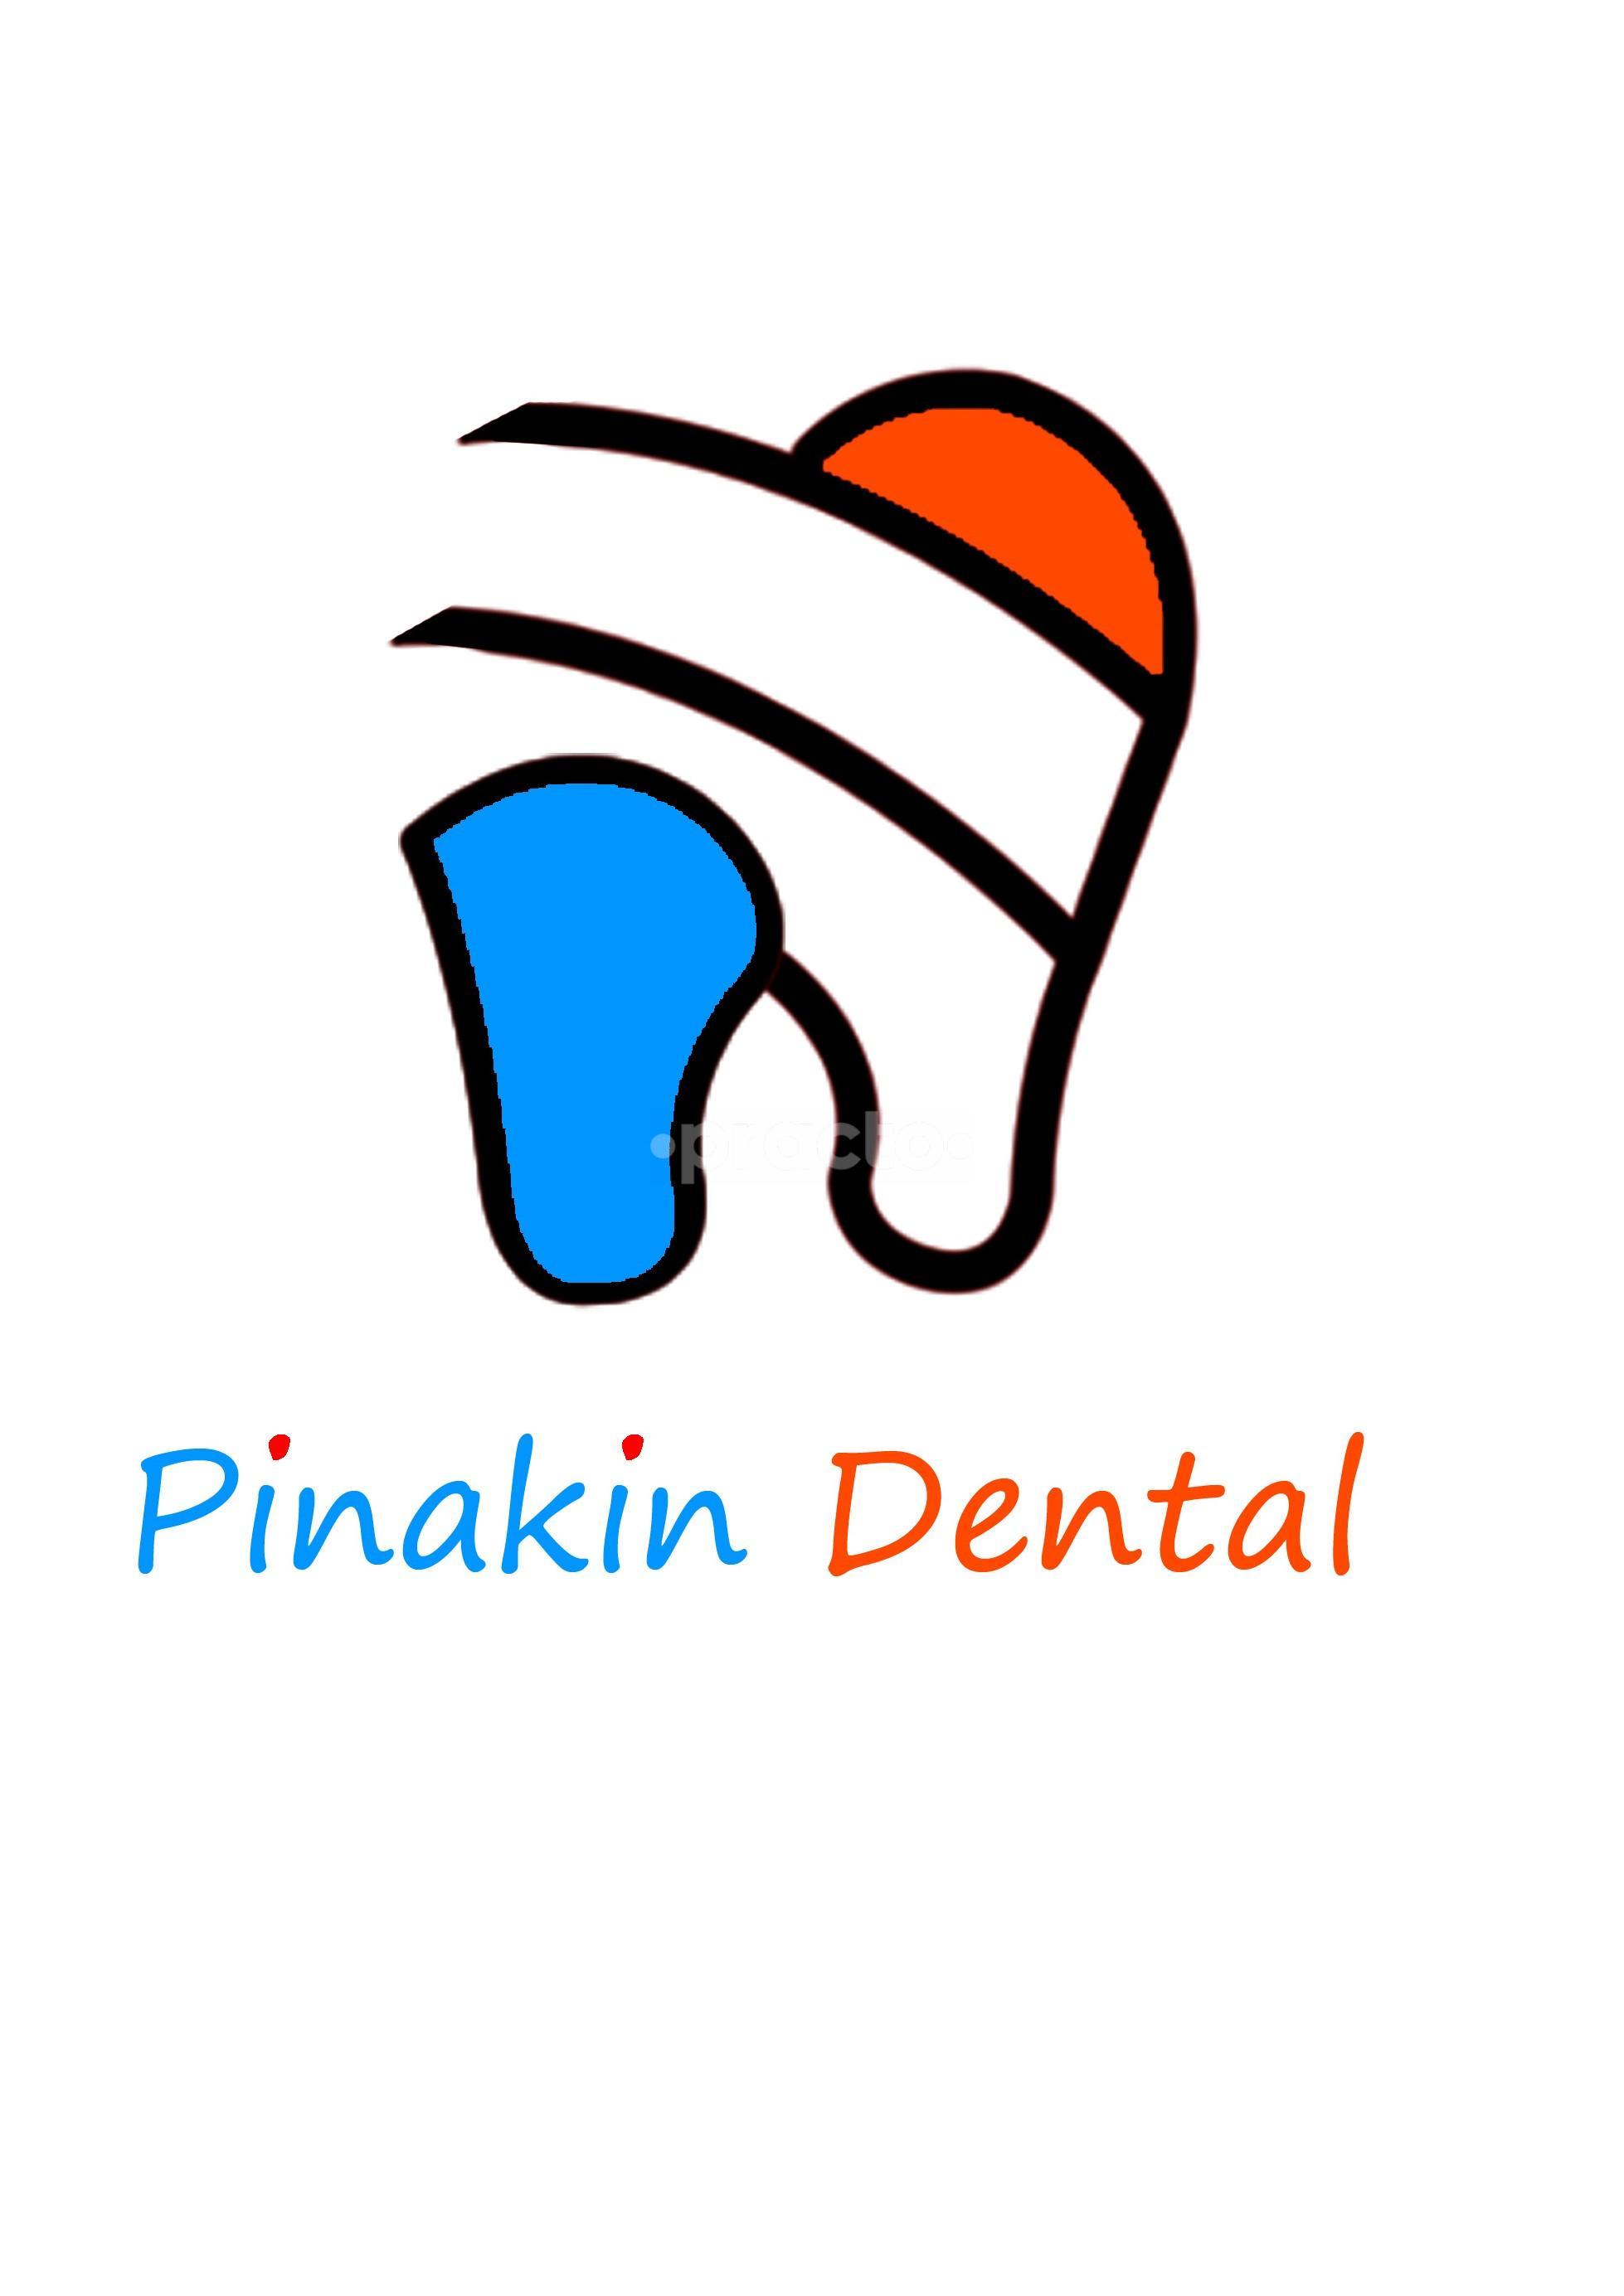 Pinakin Dental